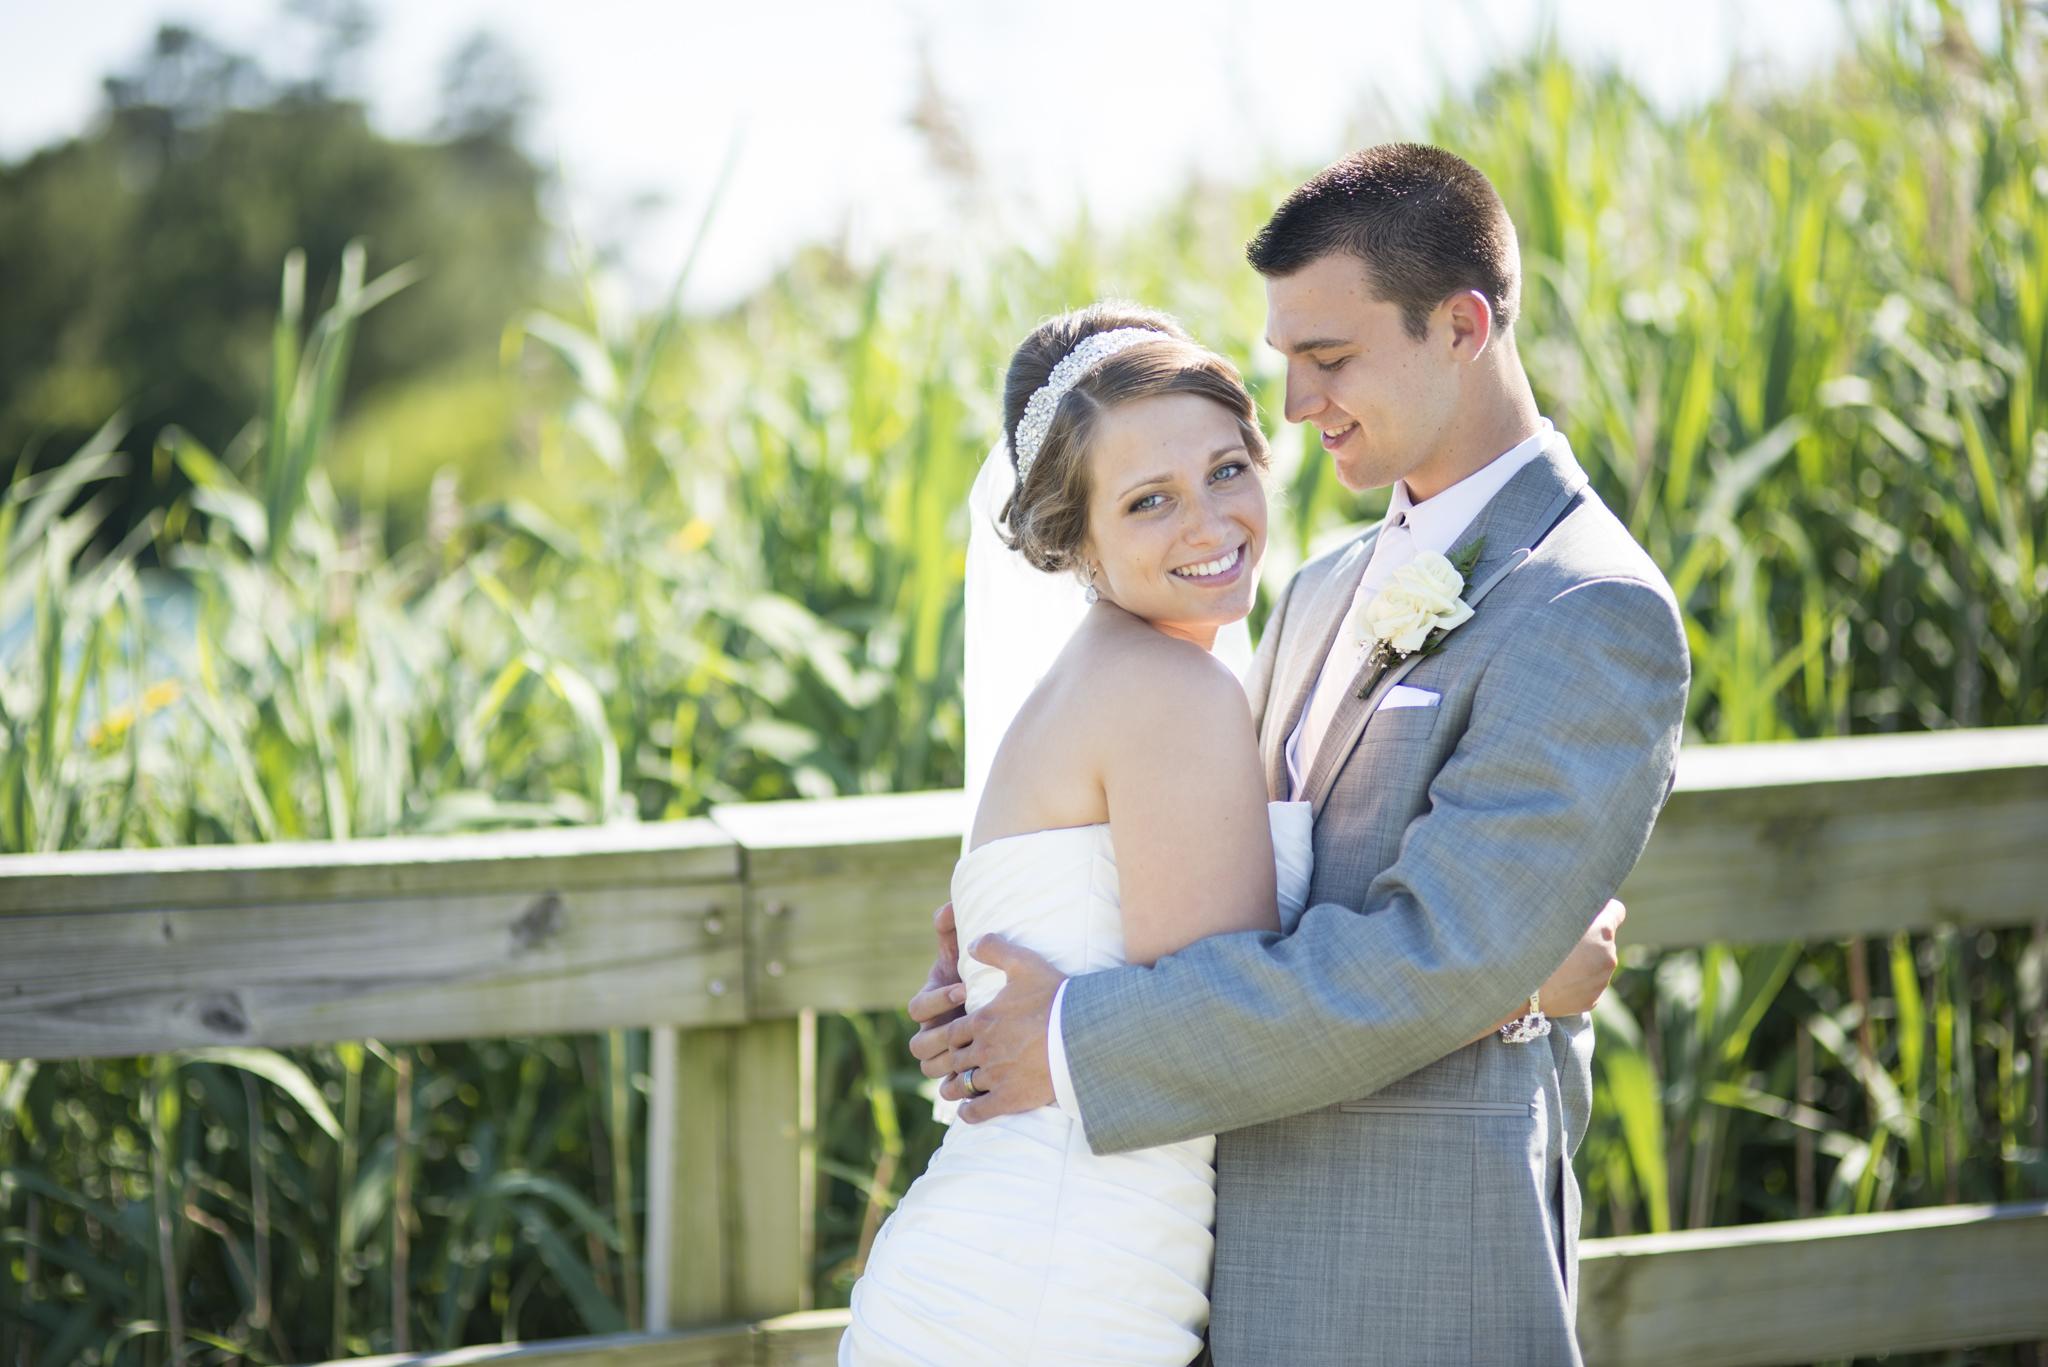 Suffolk, Virginia wedding photographer